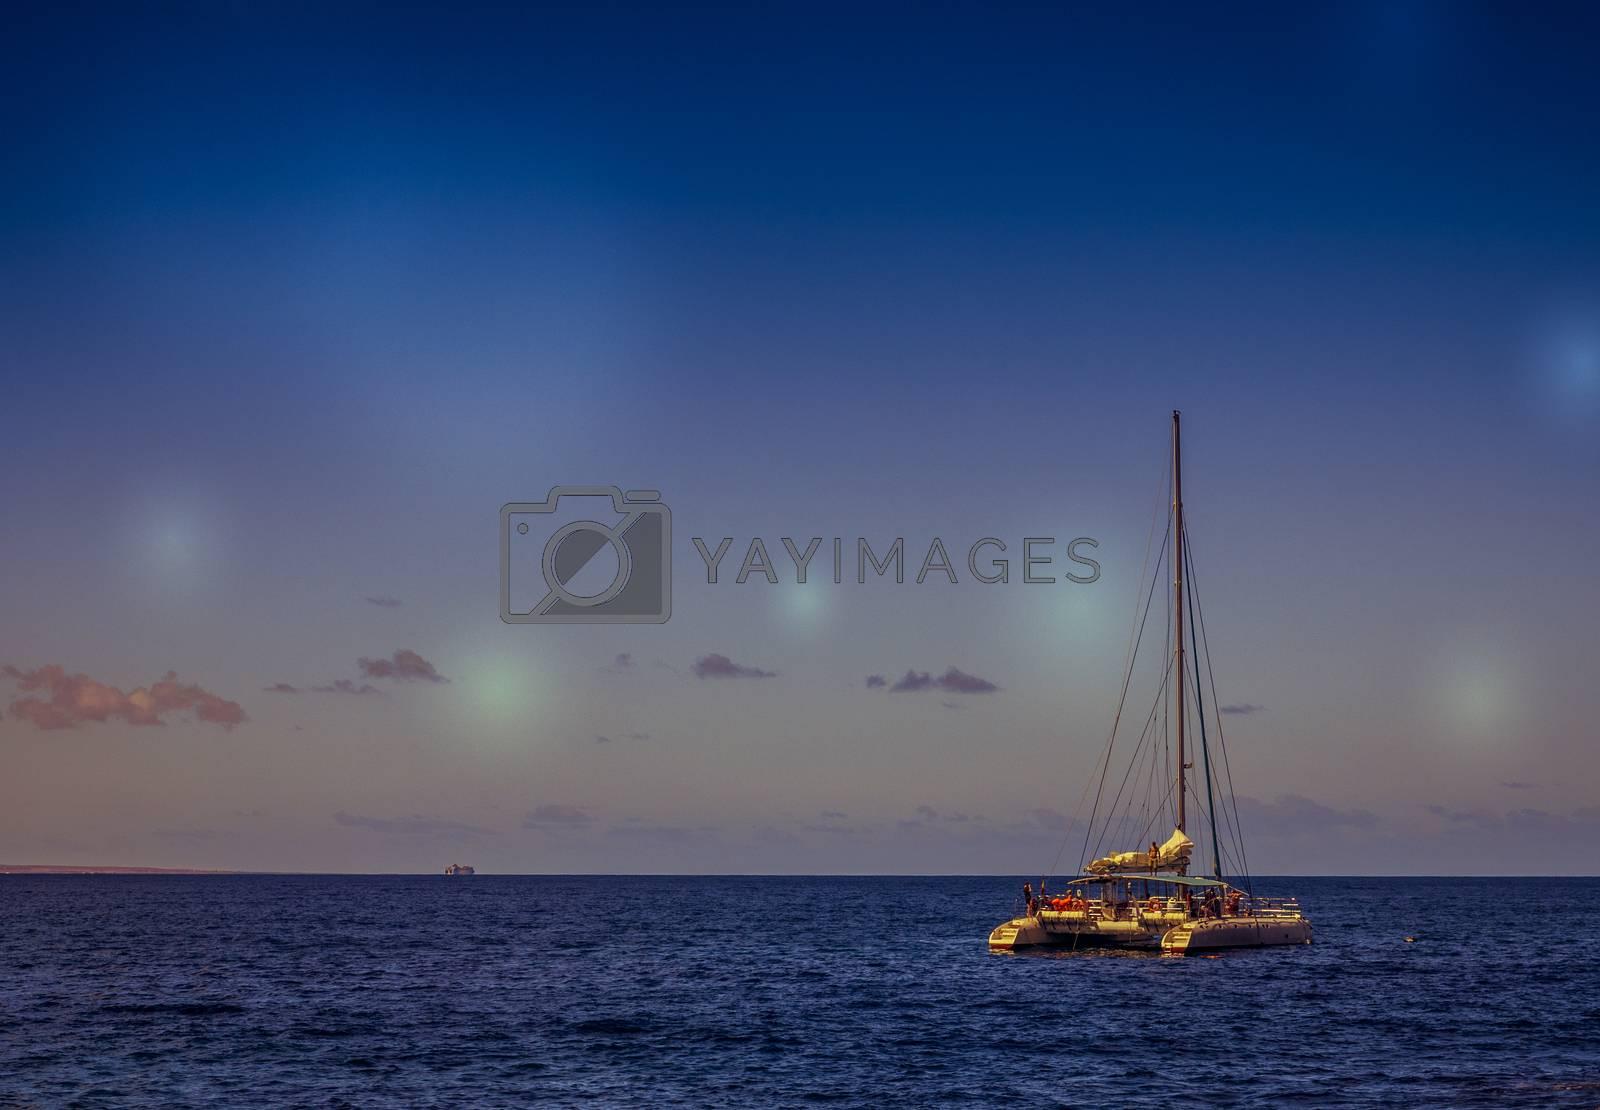 Royalty free image of Catamaran on sea by pawopa3336